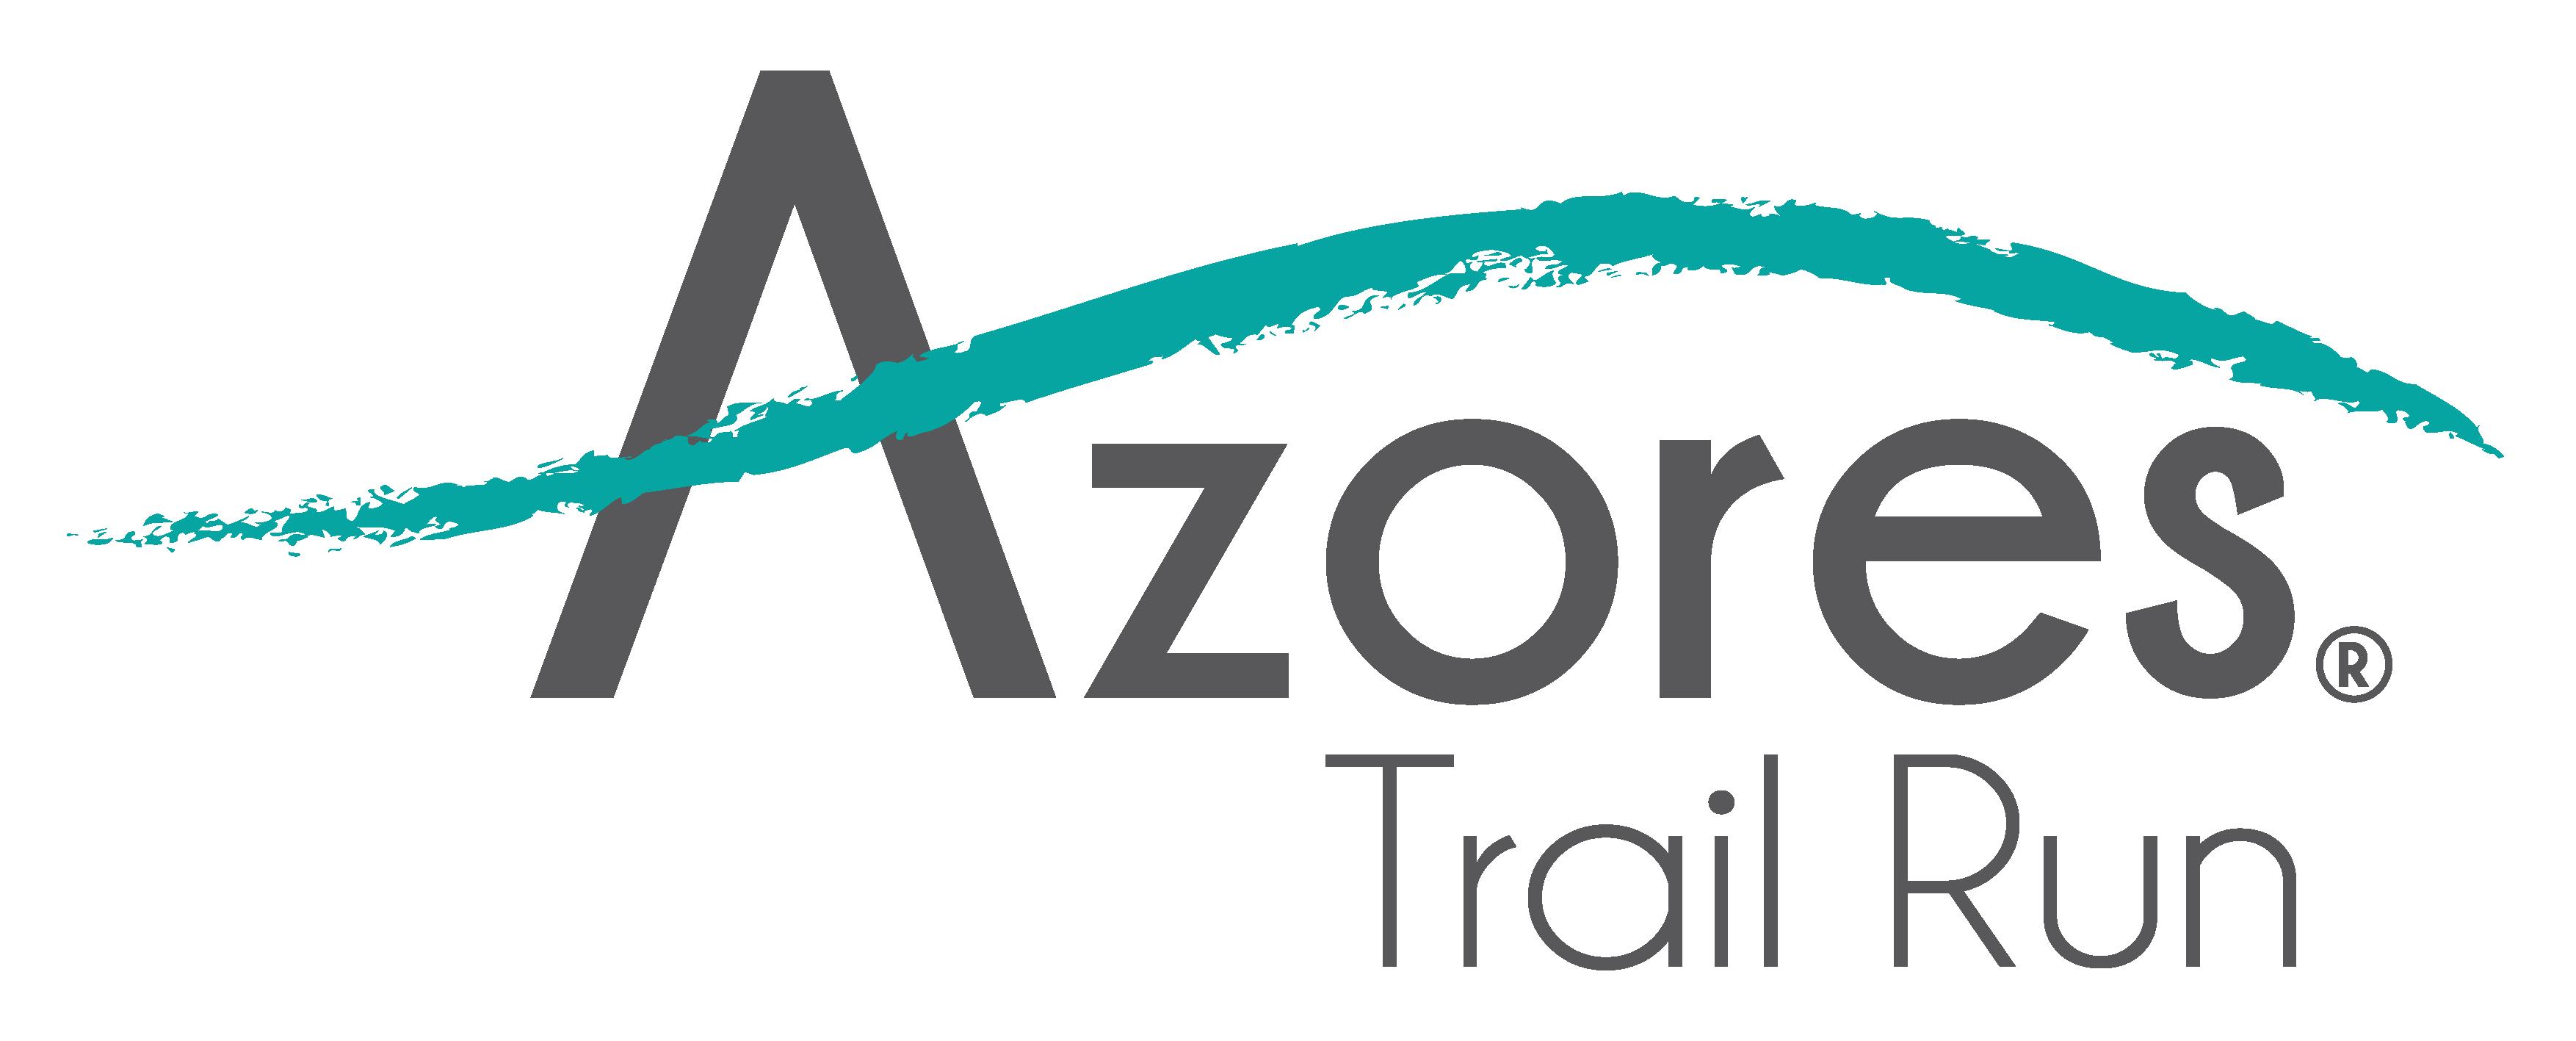 Trail Running Calendario 2020.Azores Trail Run Trail Run And Ultra Trail Race In Azores